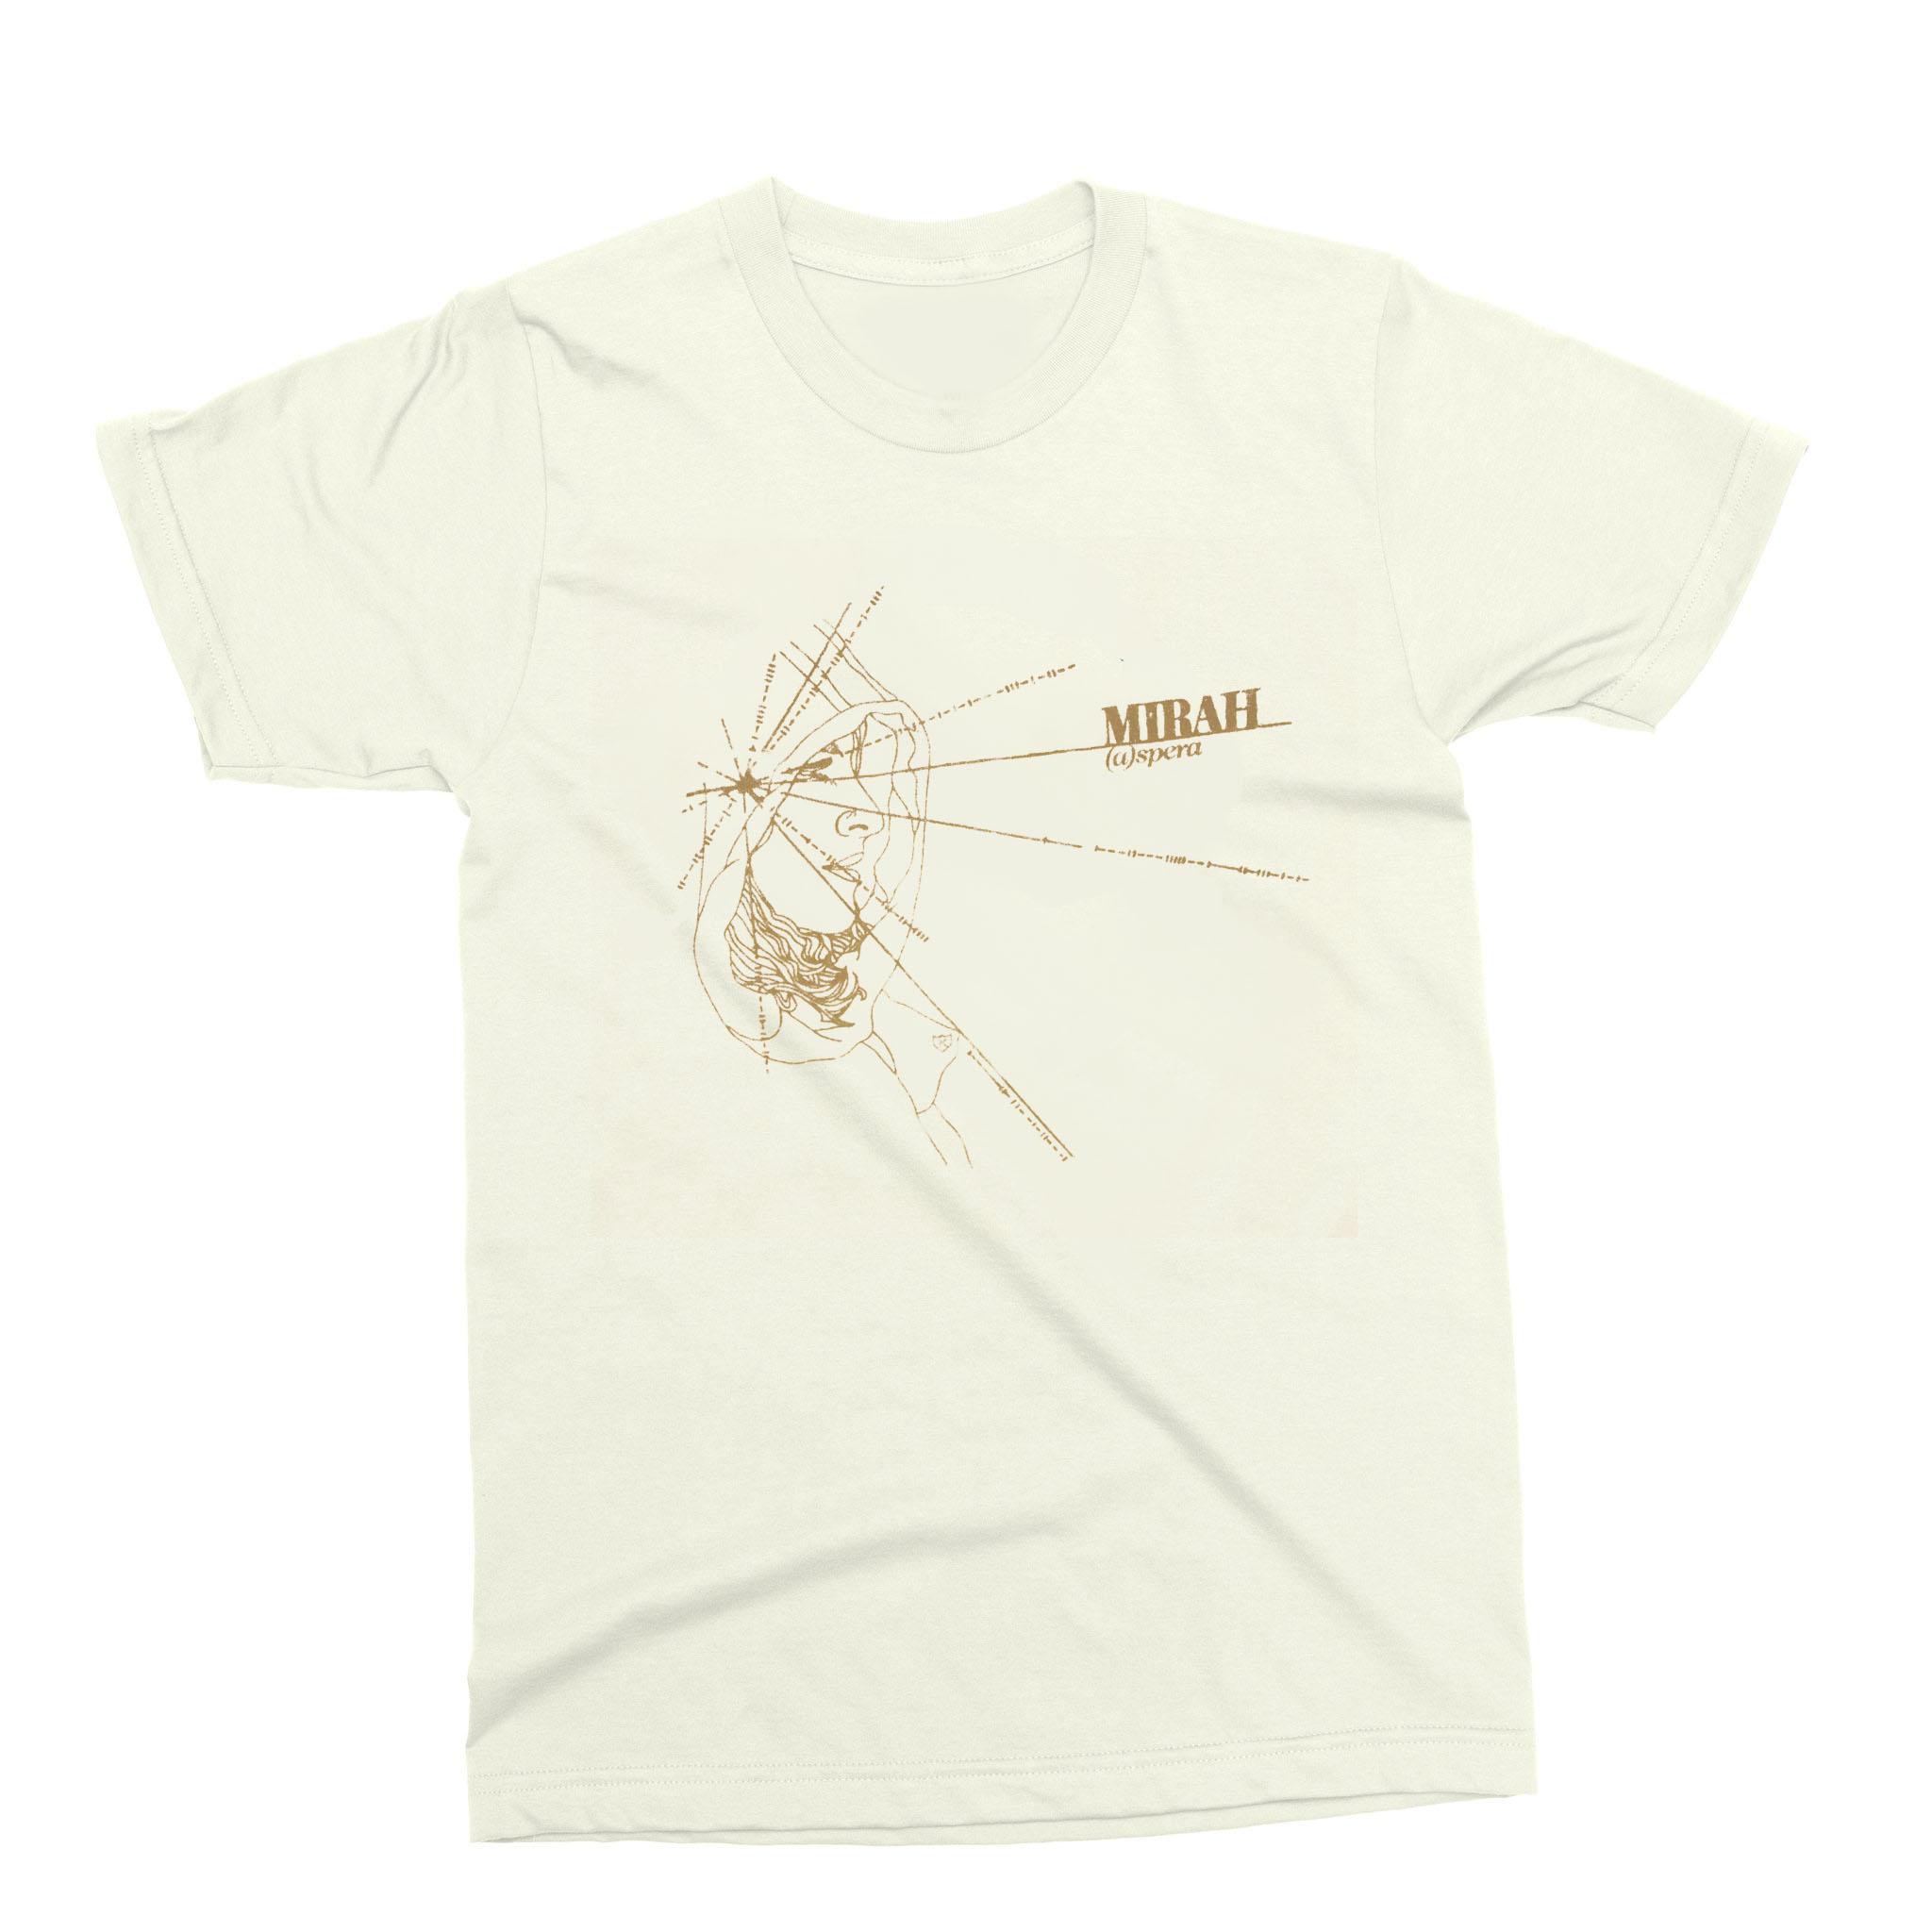 medium resolution of  a spera t shirt mirah